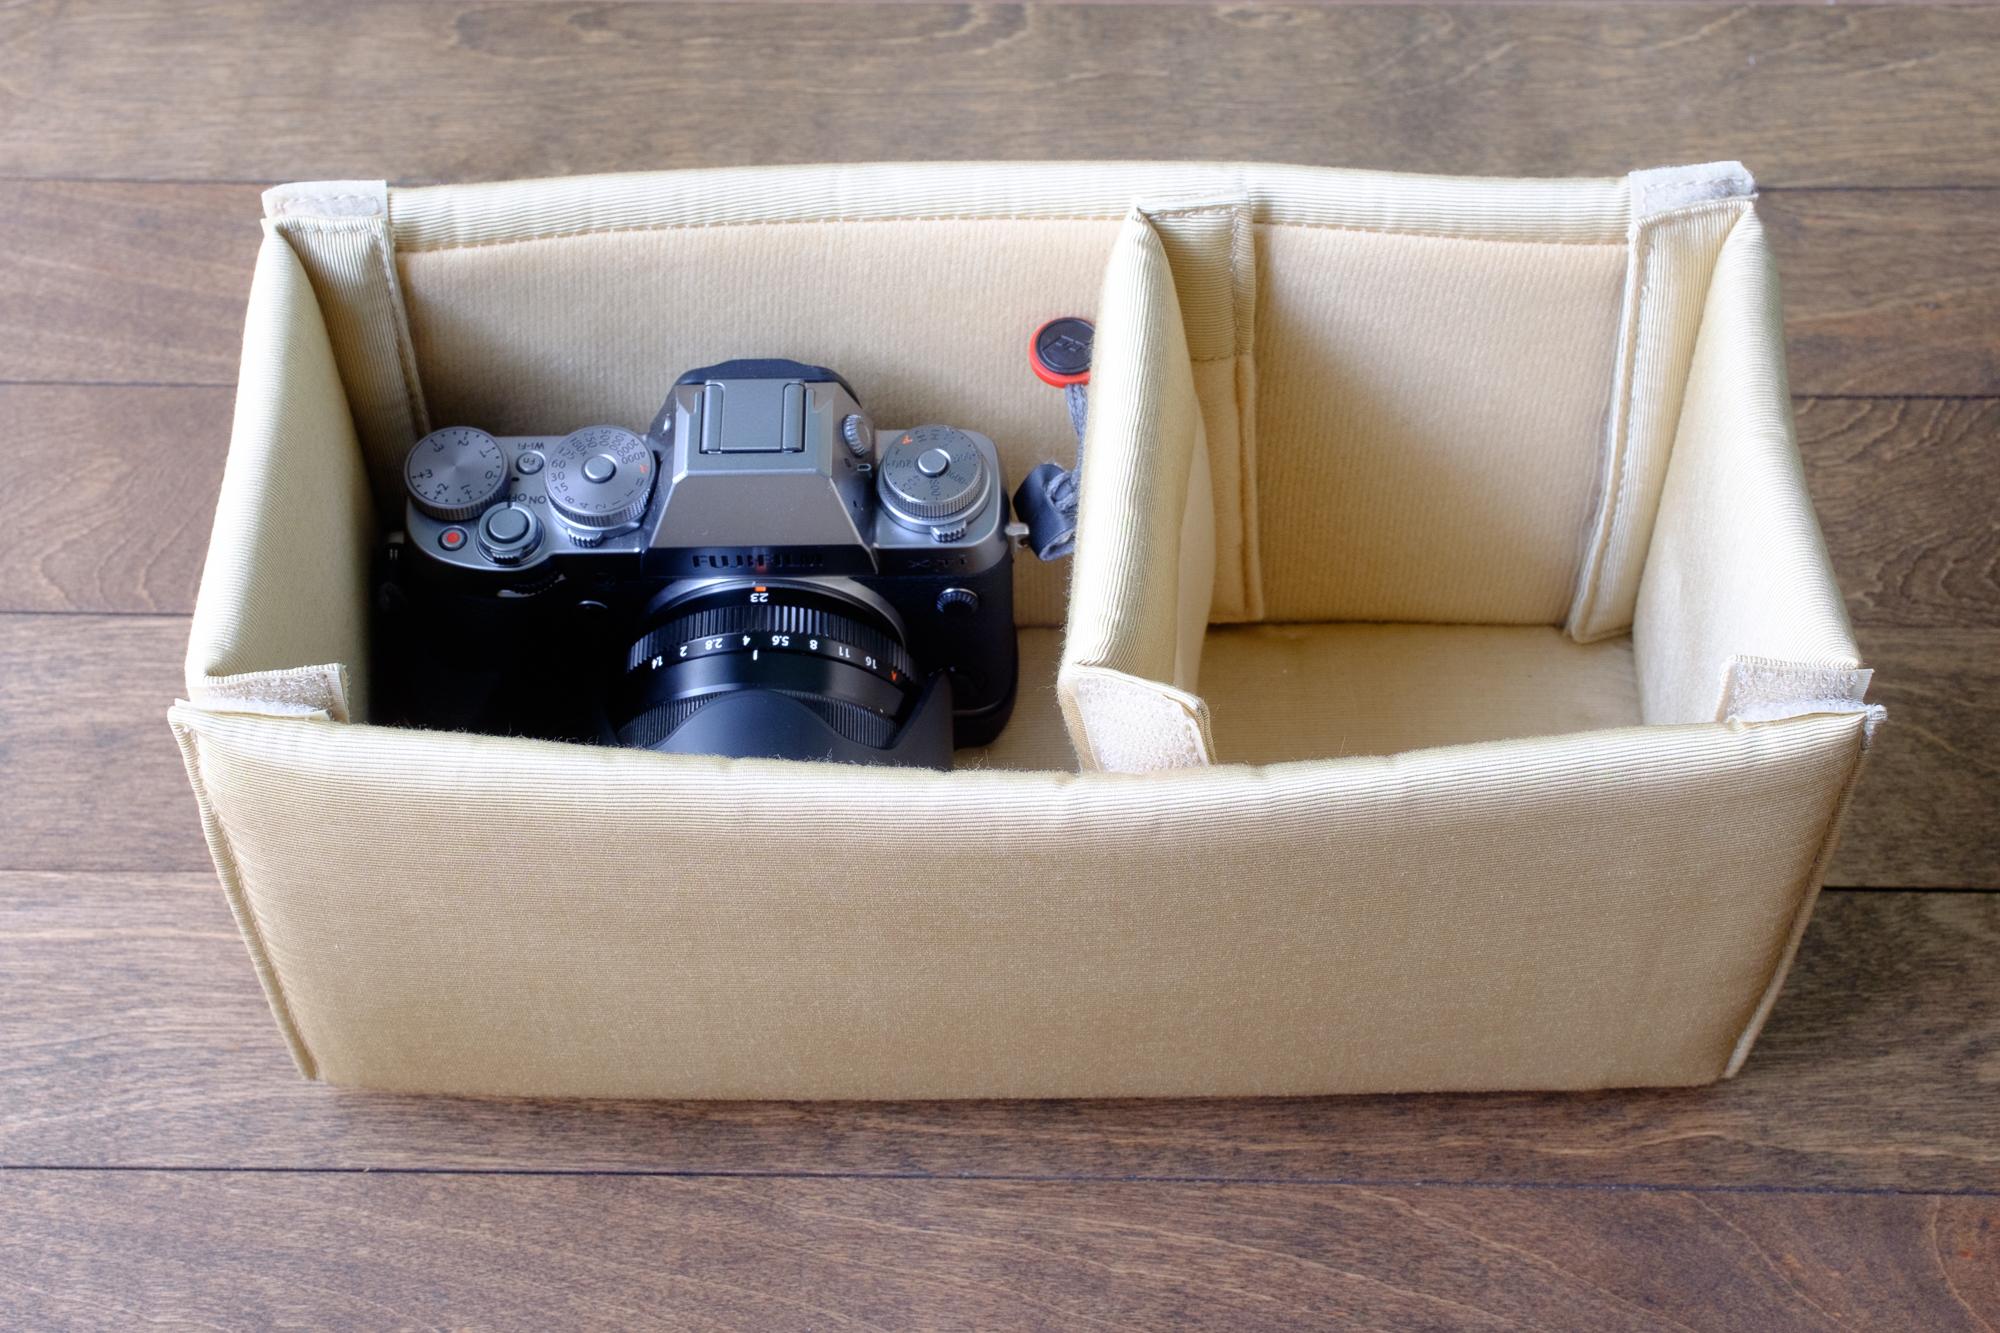 Fuji X-T1 with Fuji 23mm lens (attached)